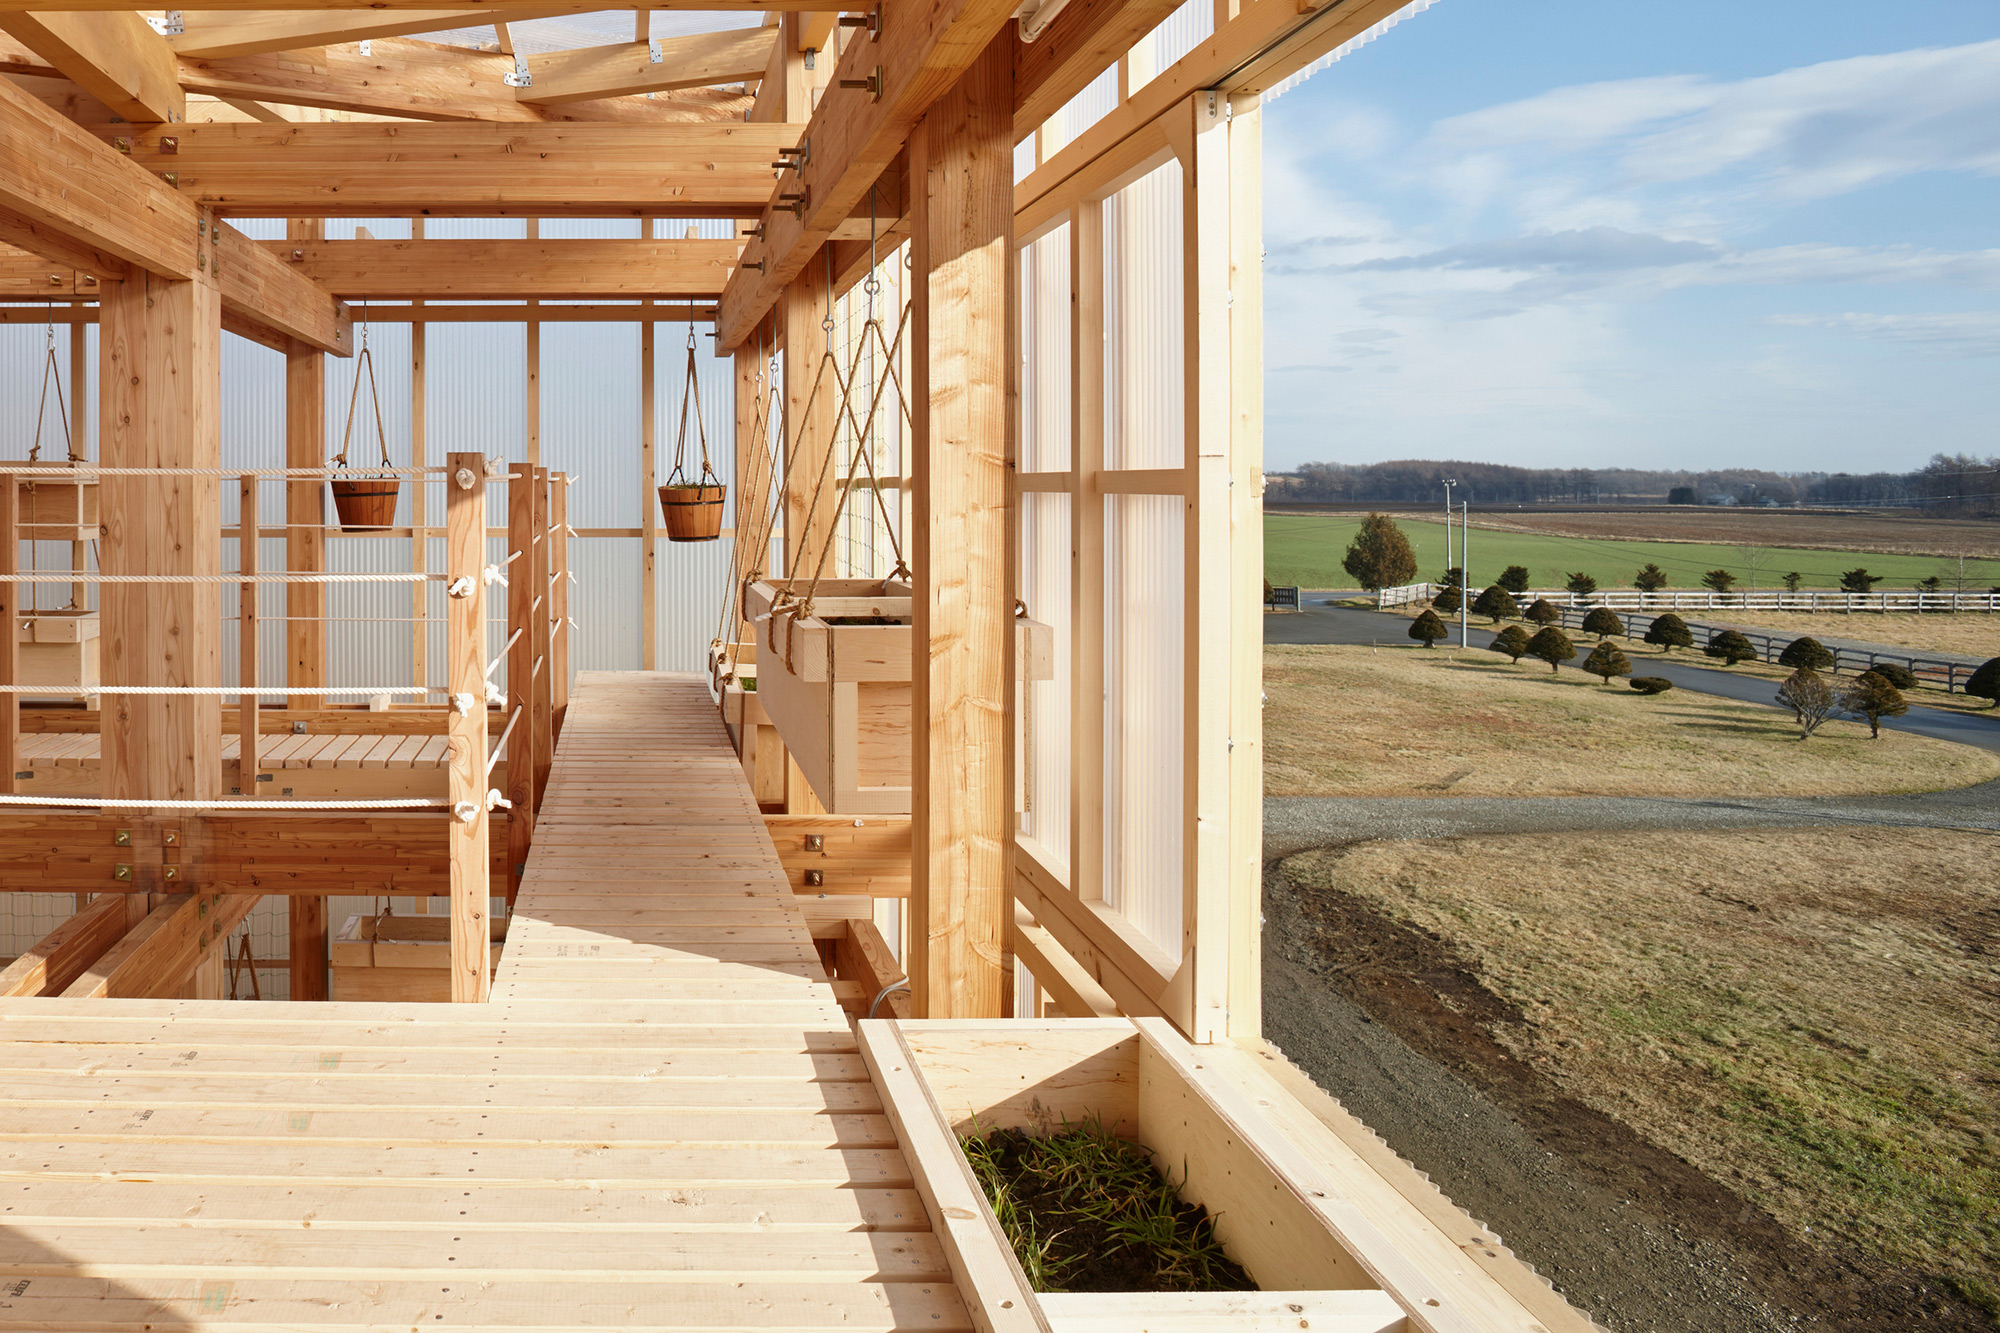 Nest We Grow / College of Environmental Design & Kengo Kuma & Associates (38)